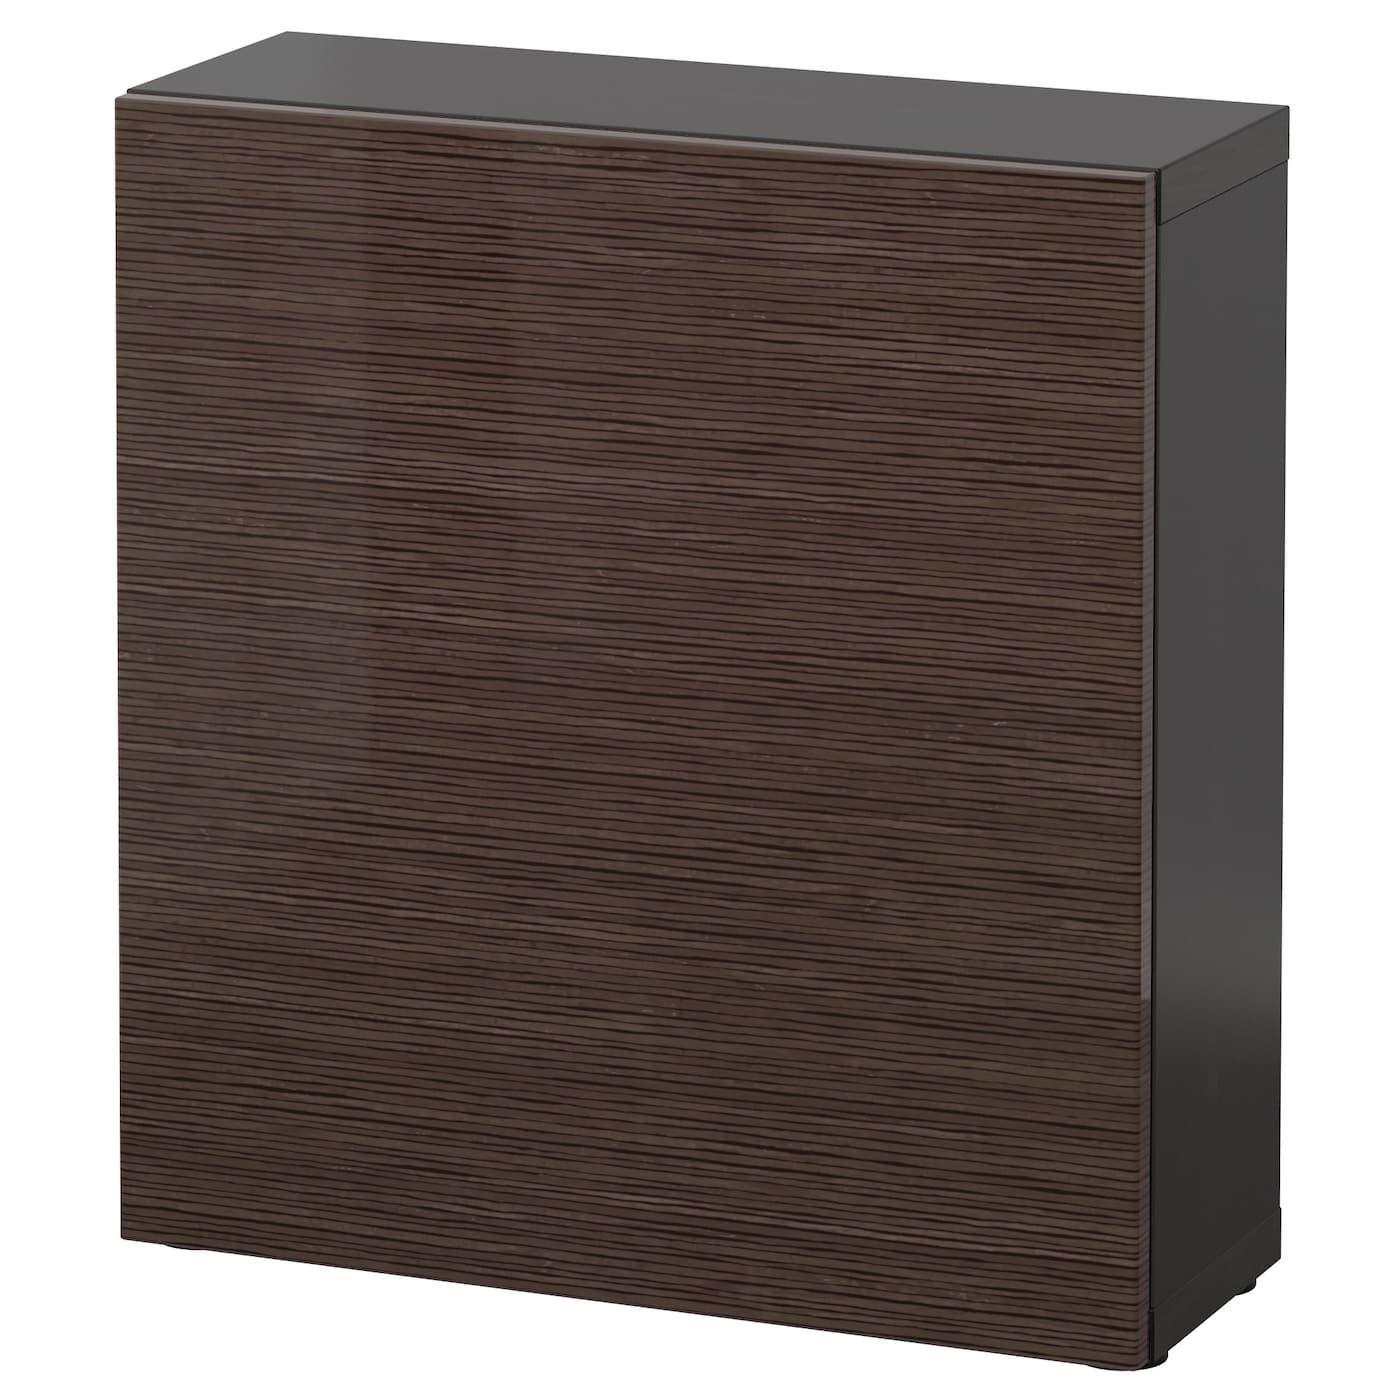 Besta Shelf Unit With Door Black Brown Selsviken High Gloss Brown 23 5 8x7 7 8x25 1 4 60x20x64 Cm Regal Mit Turen Regal Hochglanz